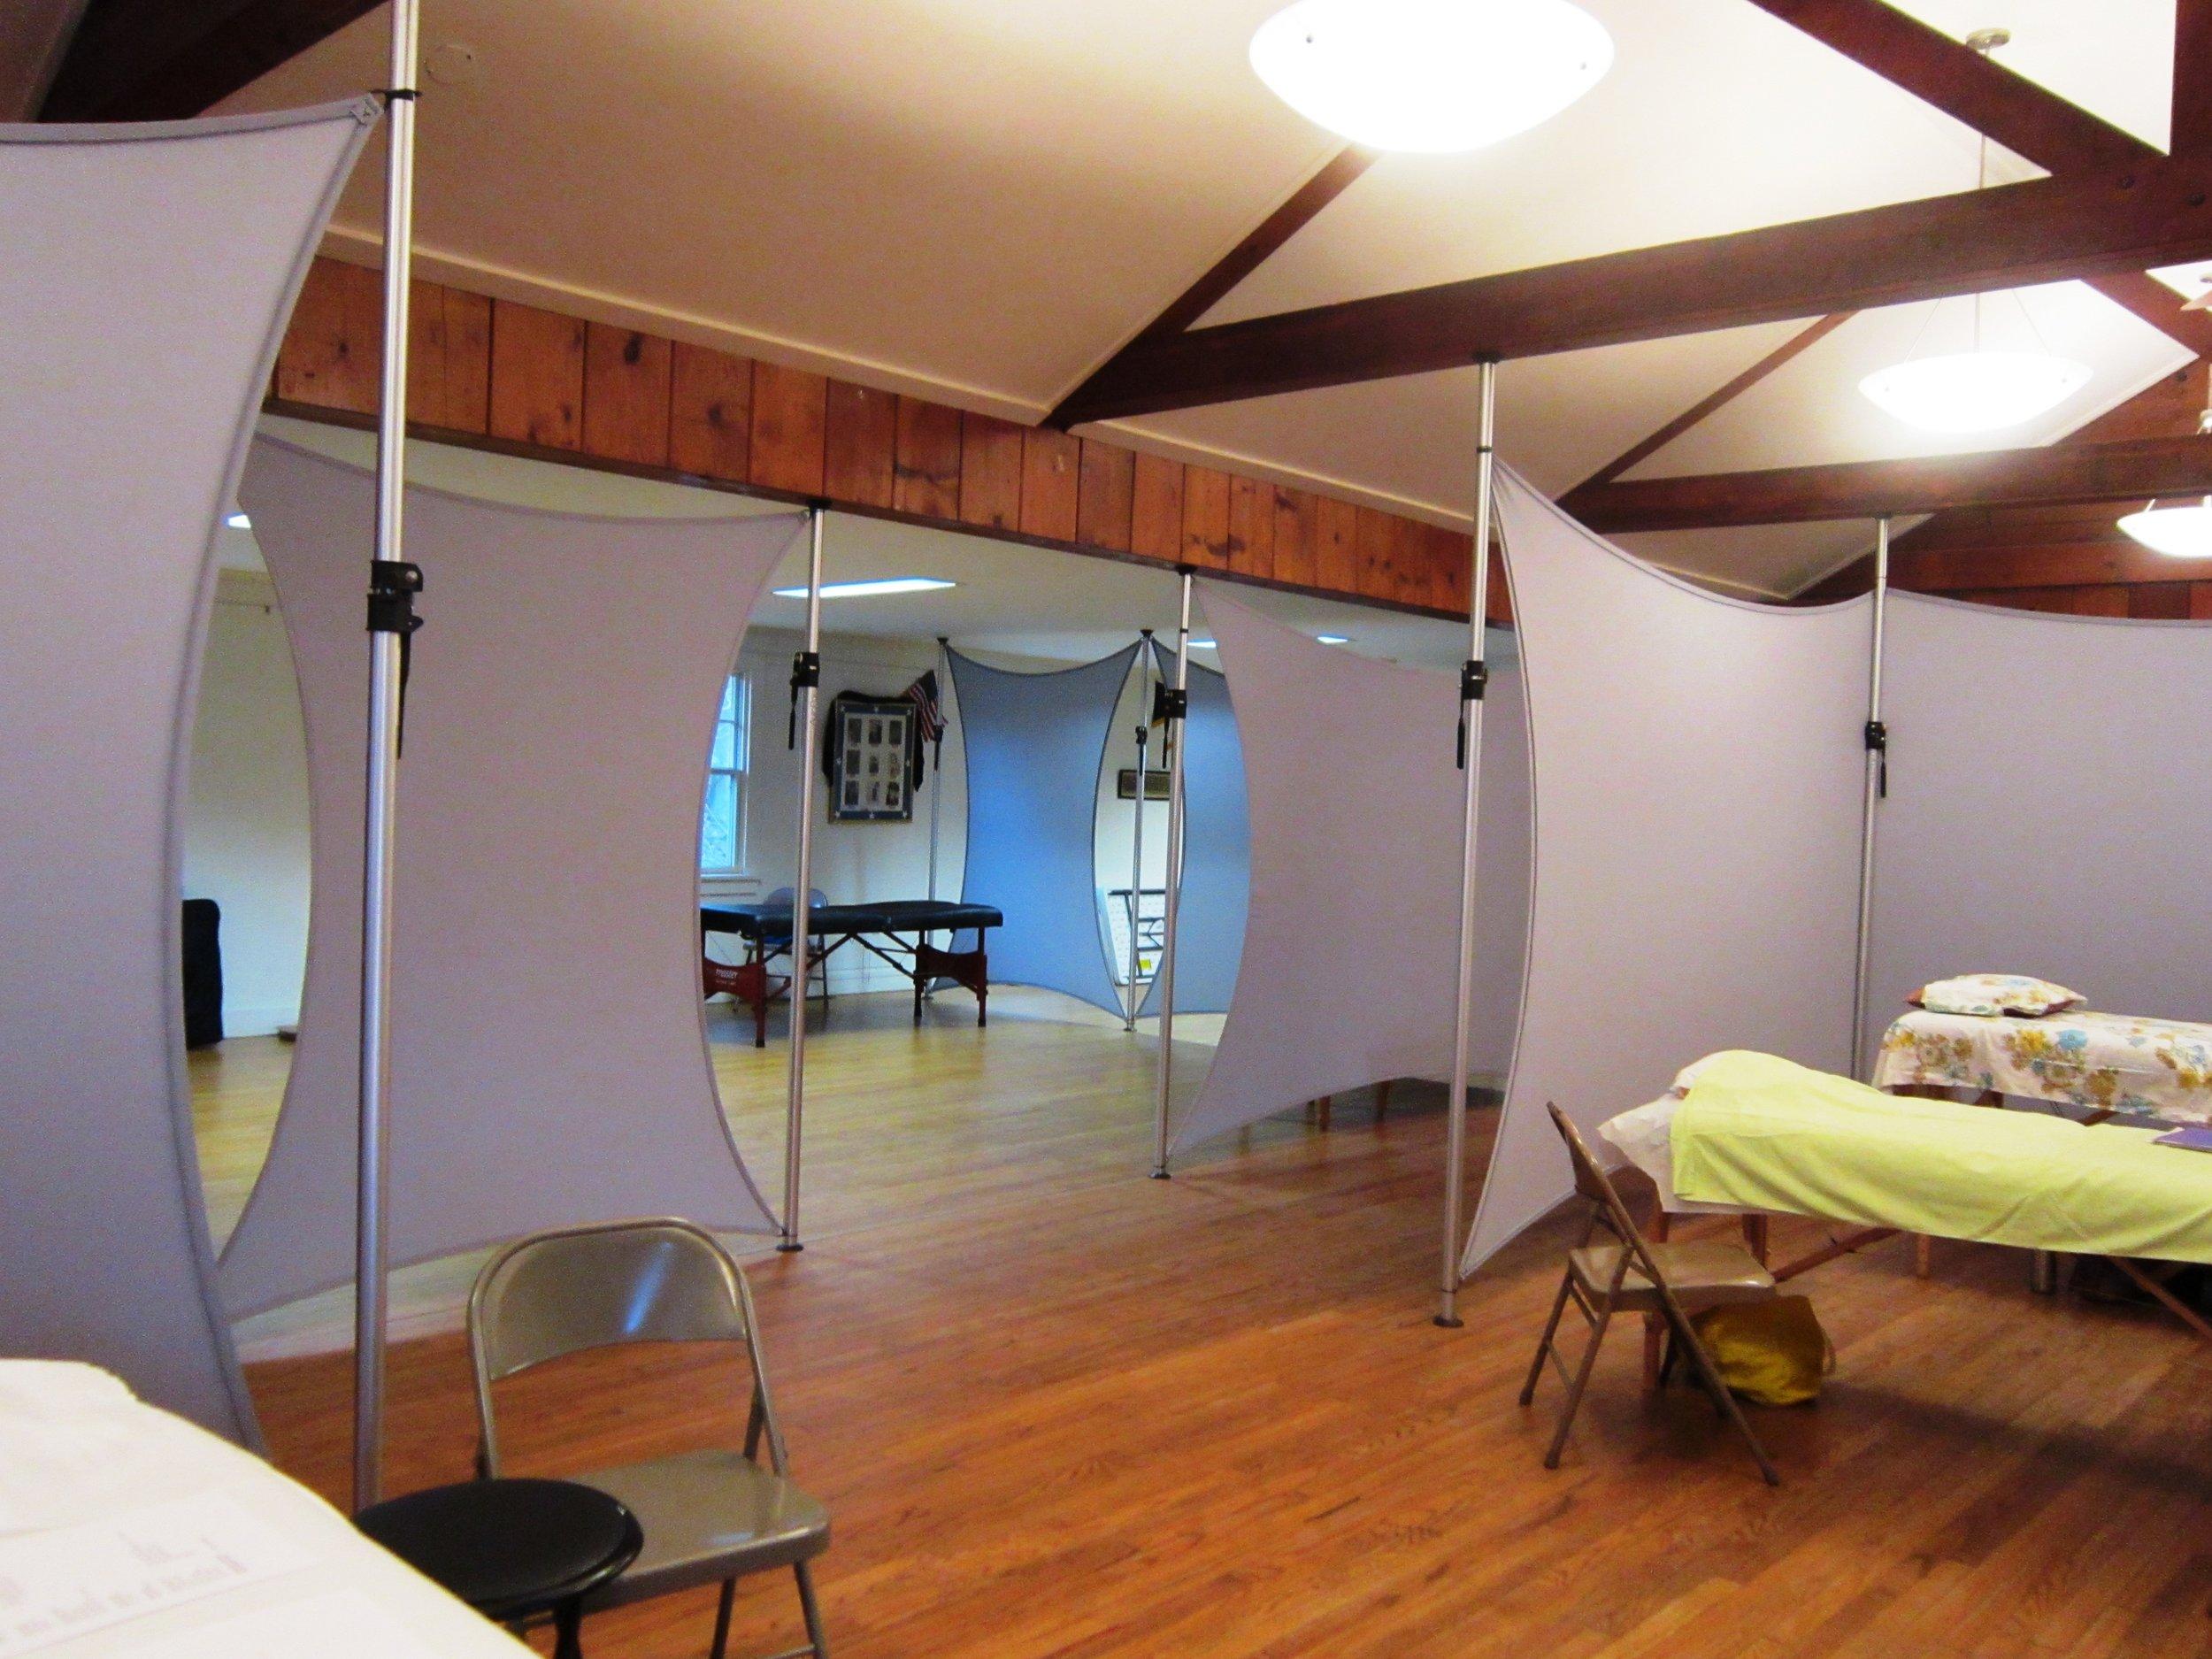 Holistic Health Center set-up at Marbletown Community Center